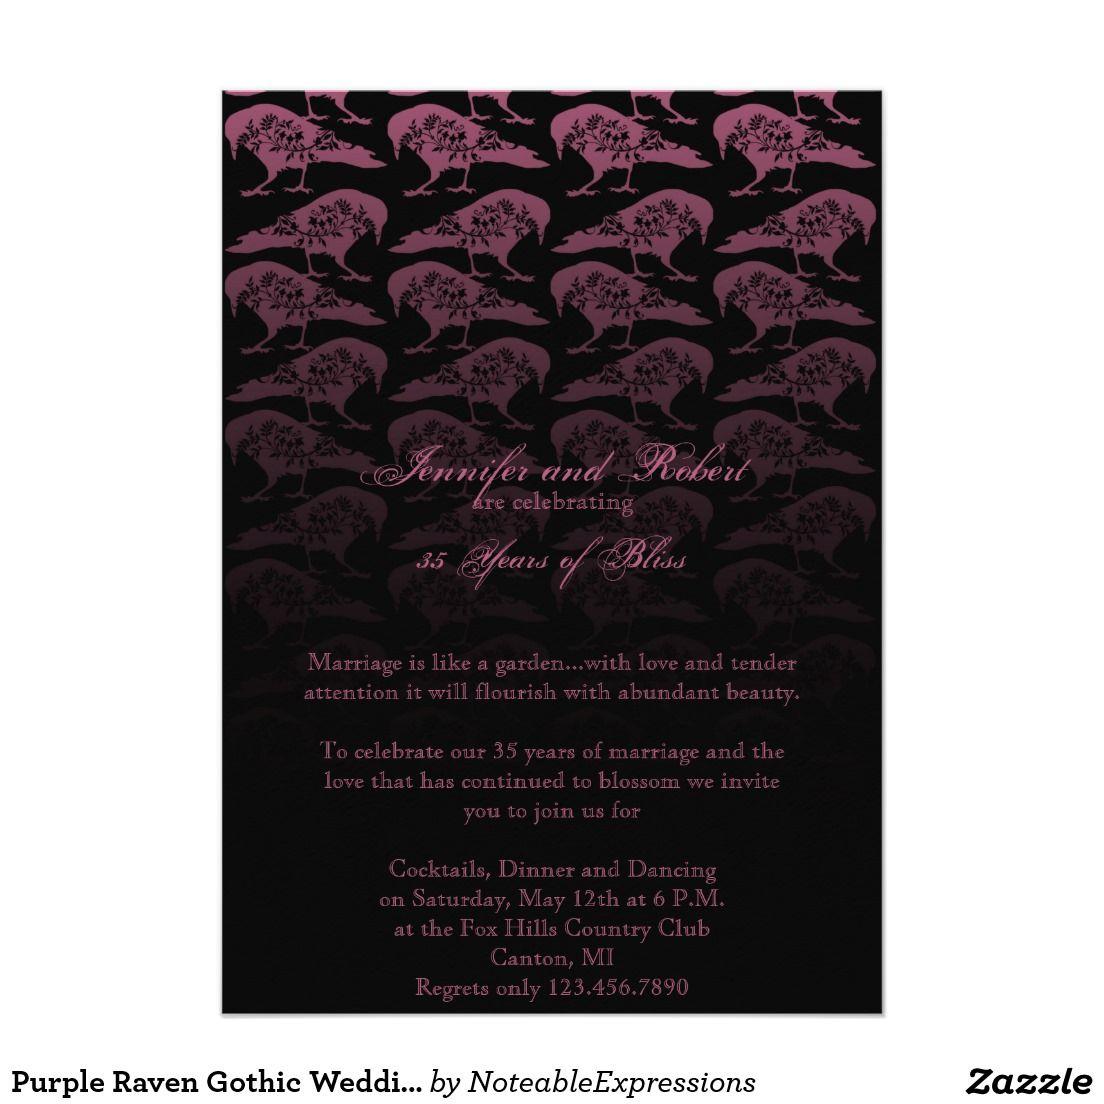 Purple raven gothic wedding anniversary card anniversary purple raven gothic wedding anniversary card kristyandbryce Images